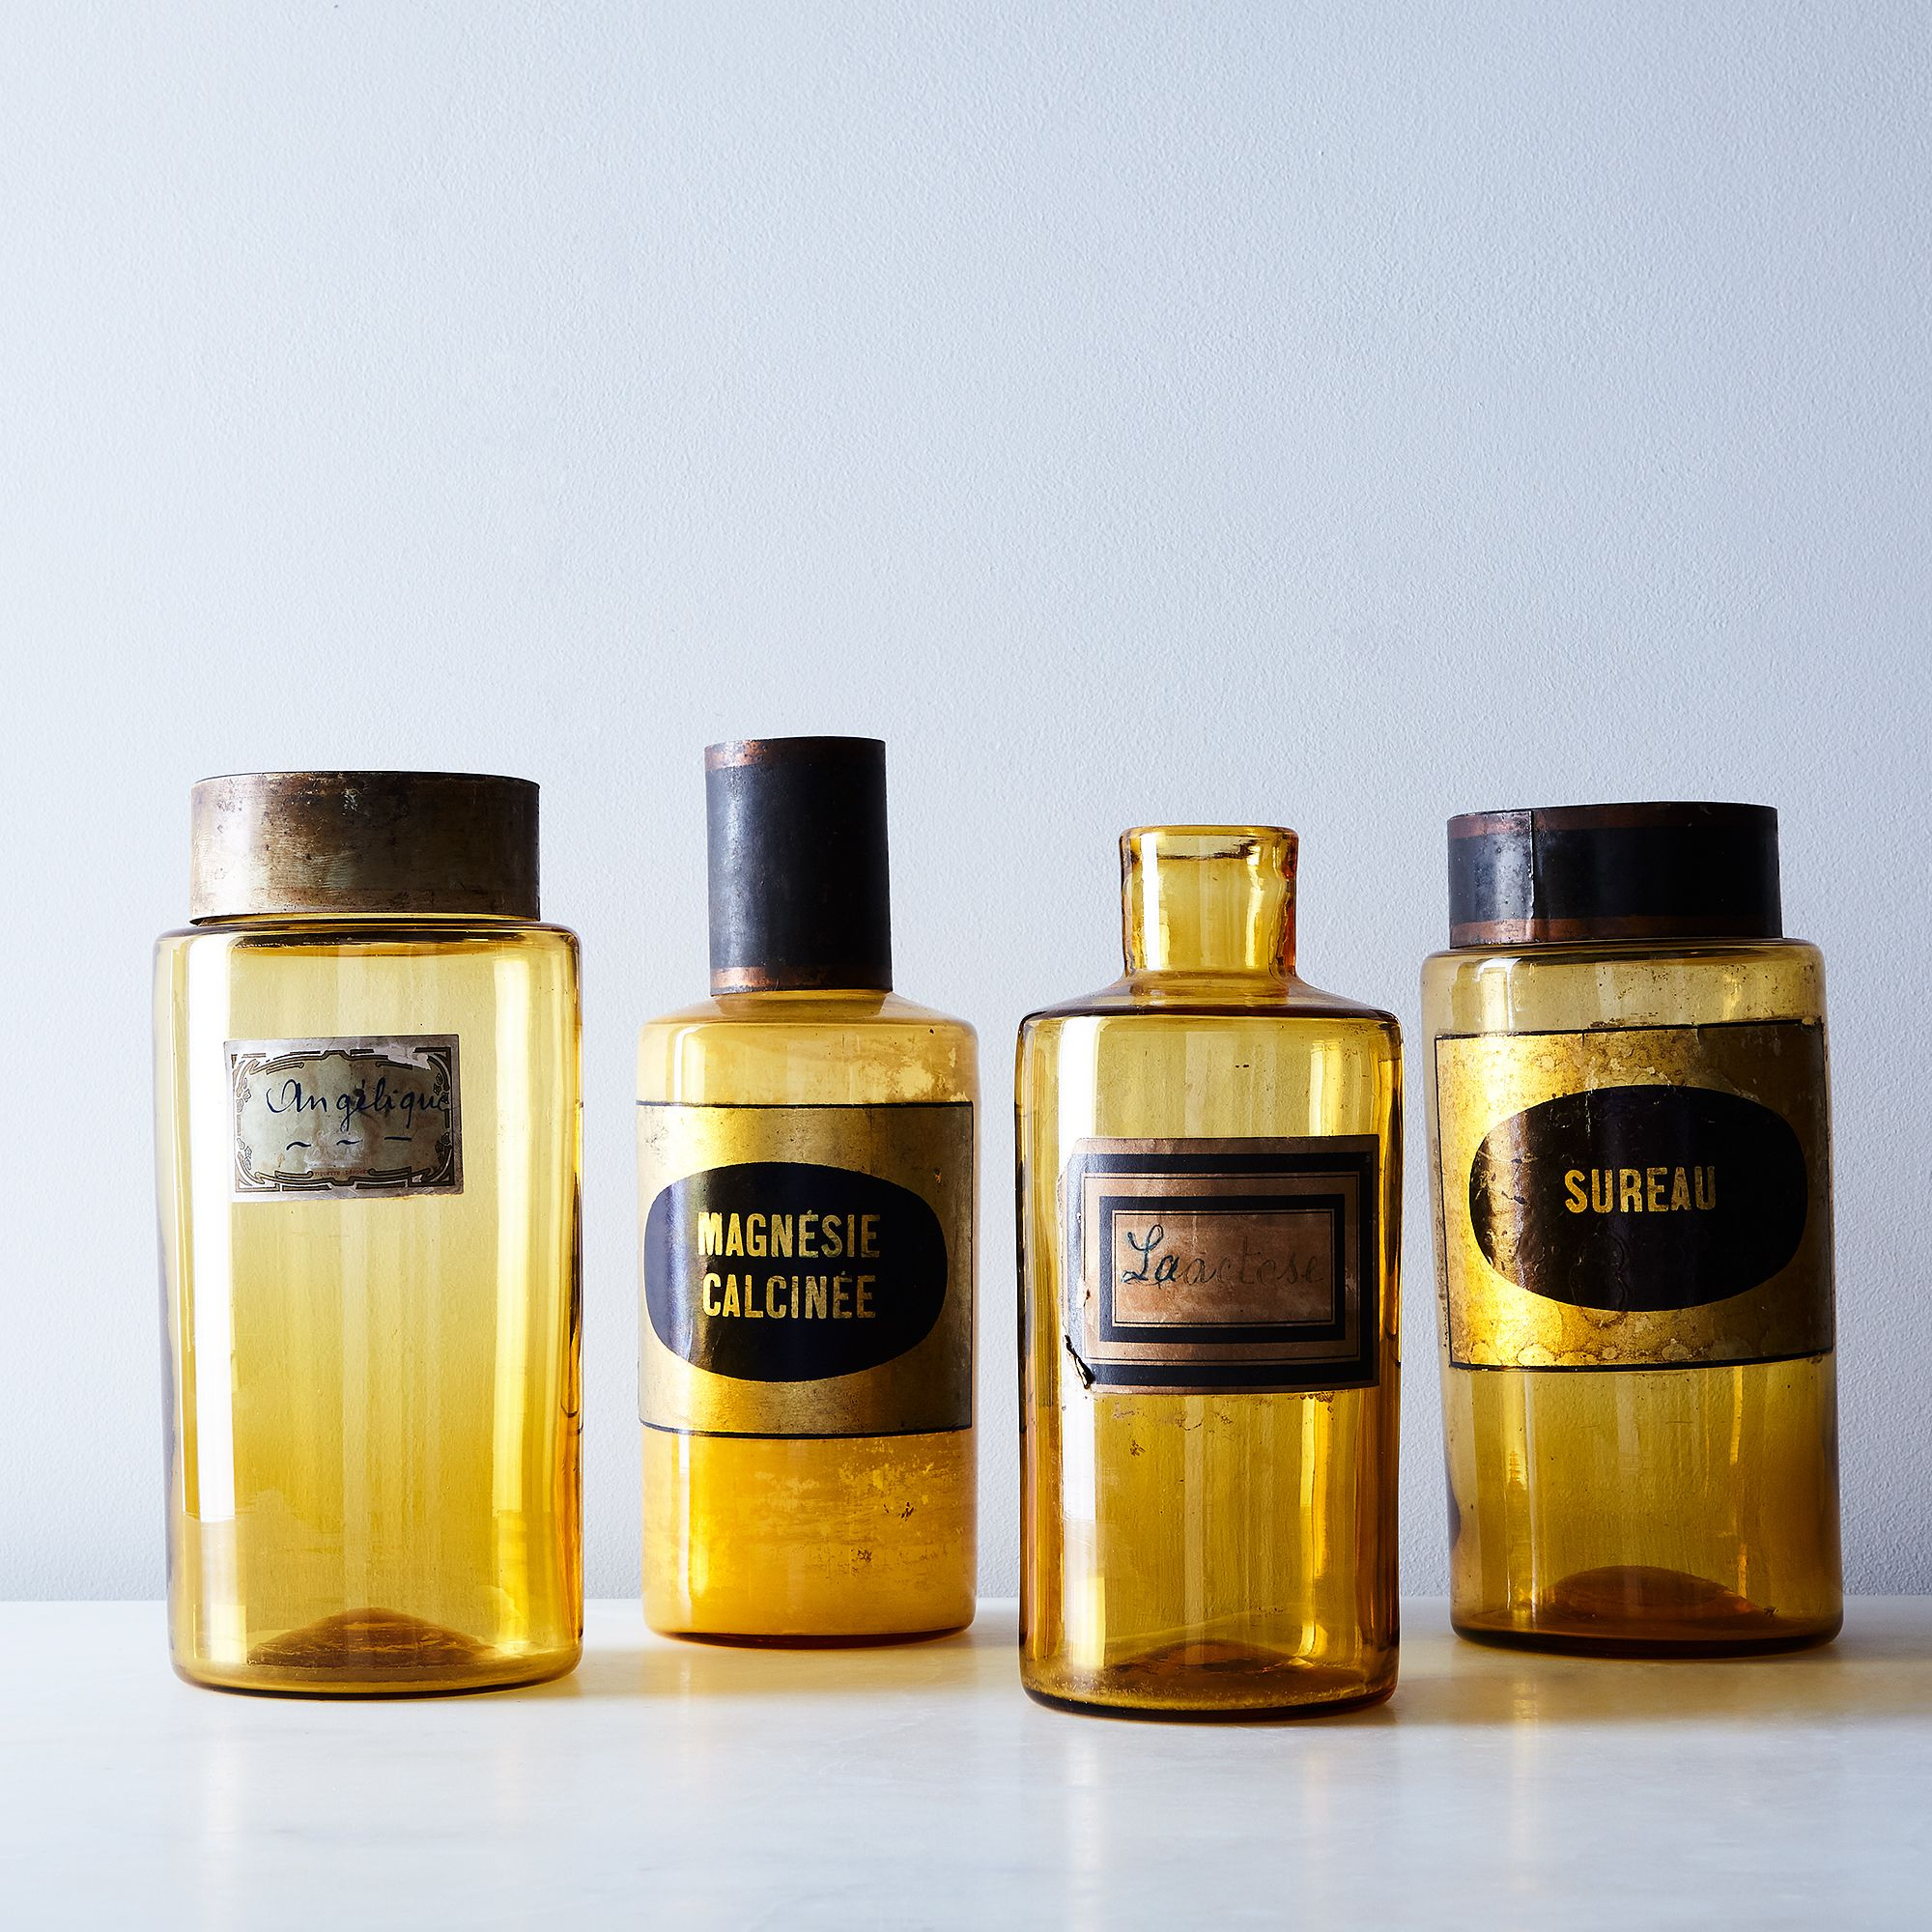 7ef0310d f17f 4b63 93bf ae9f09e822ed  2017 0609 food52 vintage shop vintage large amber apothecary jars silo rocky luten 058